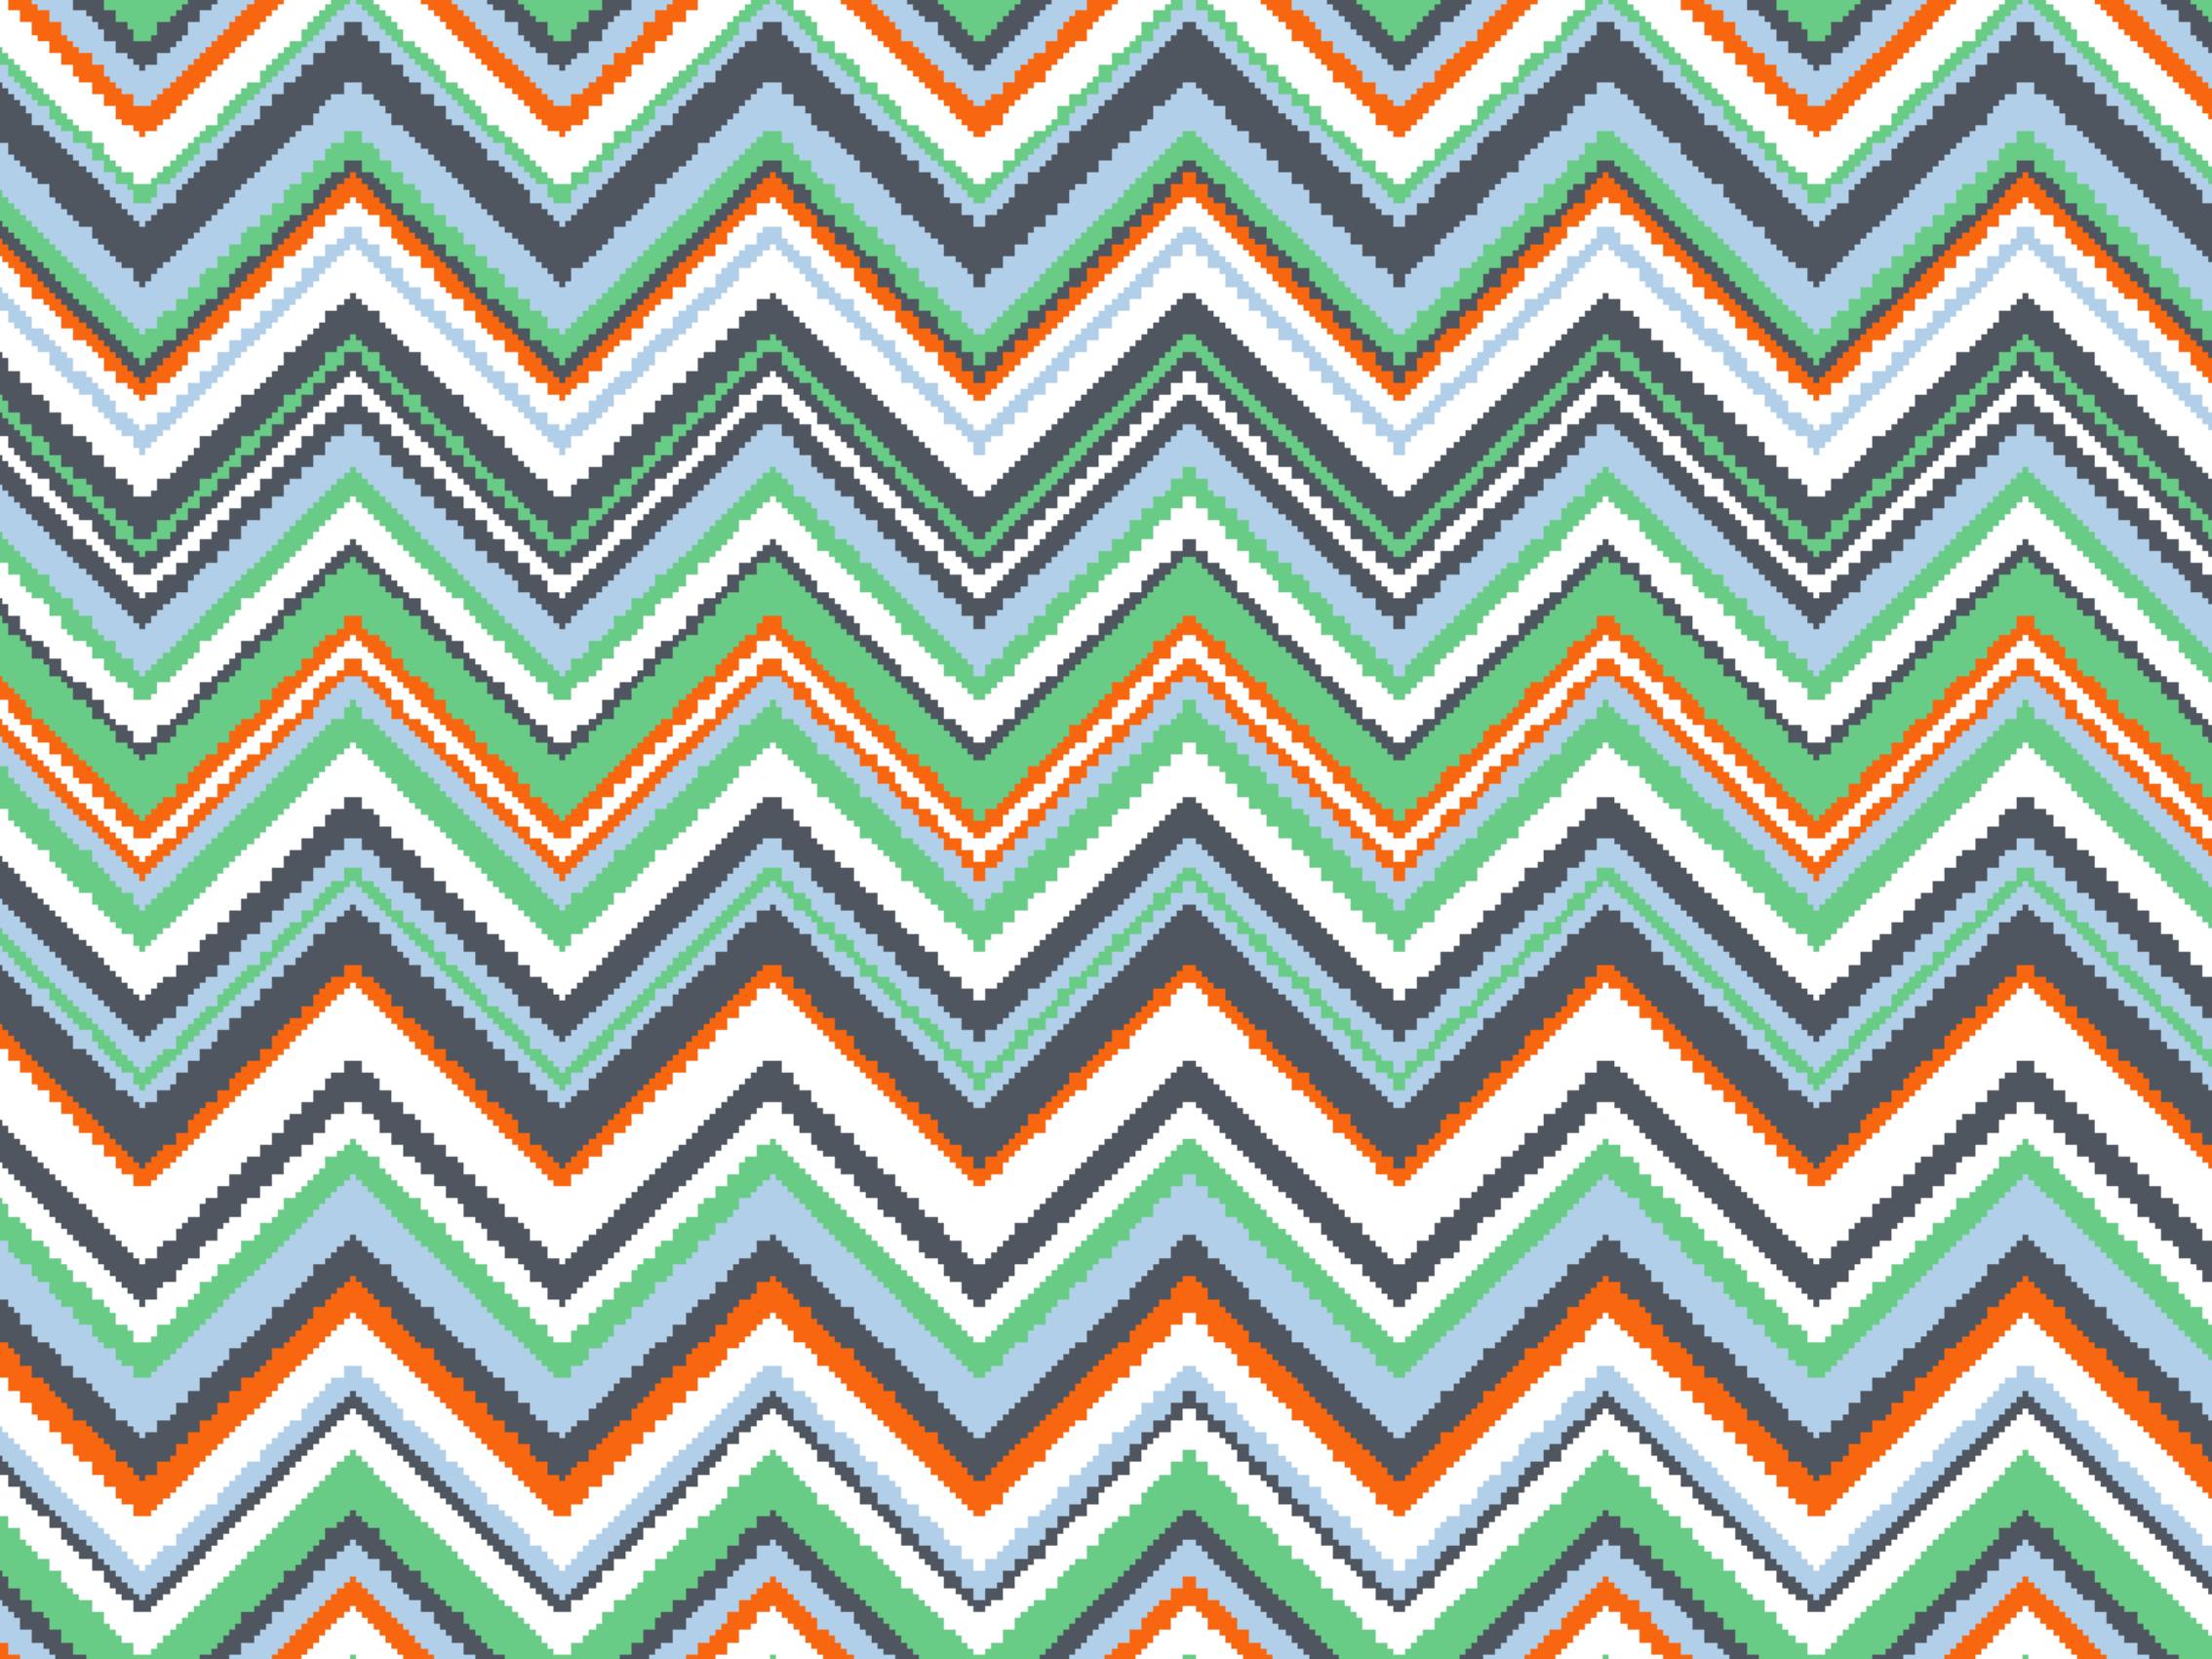 Zigzag pattern 999-1880